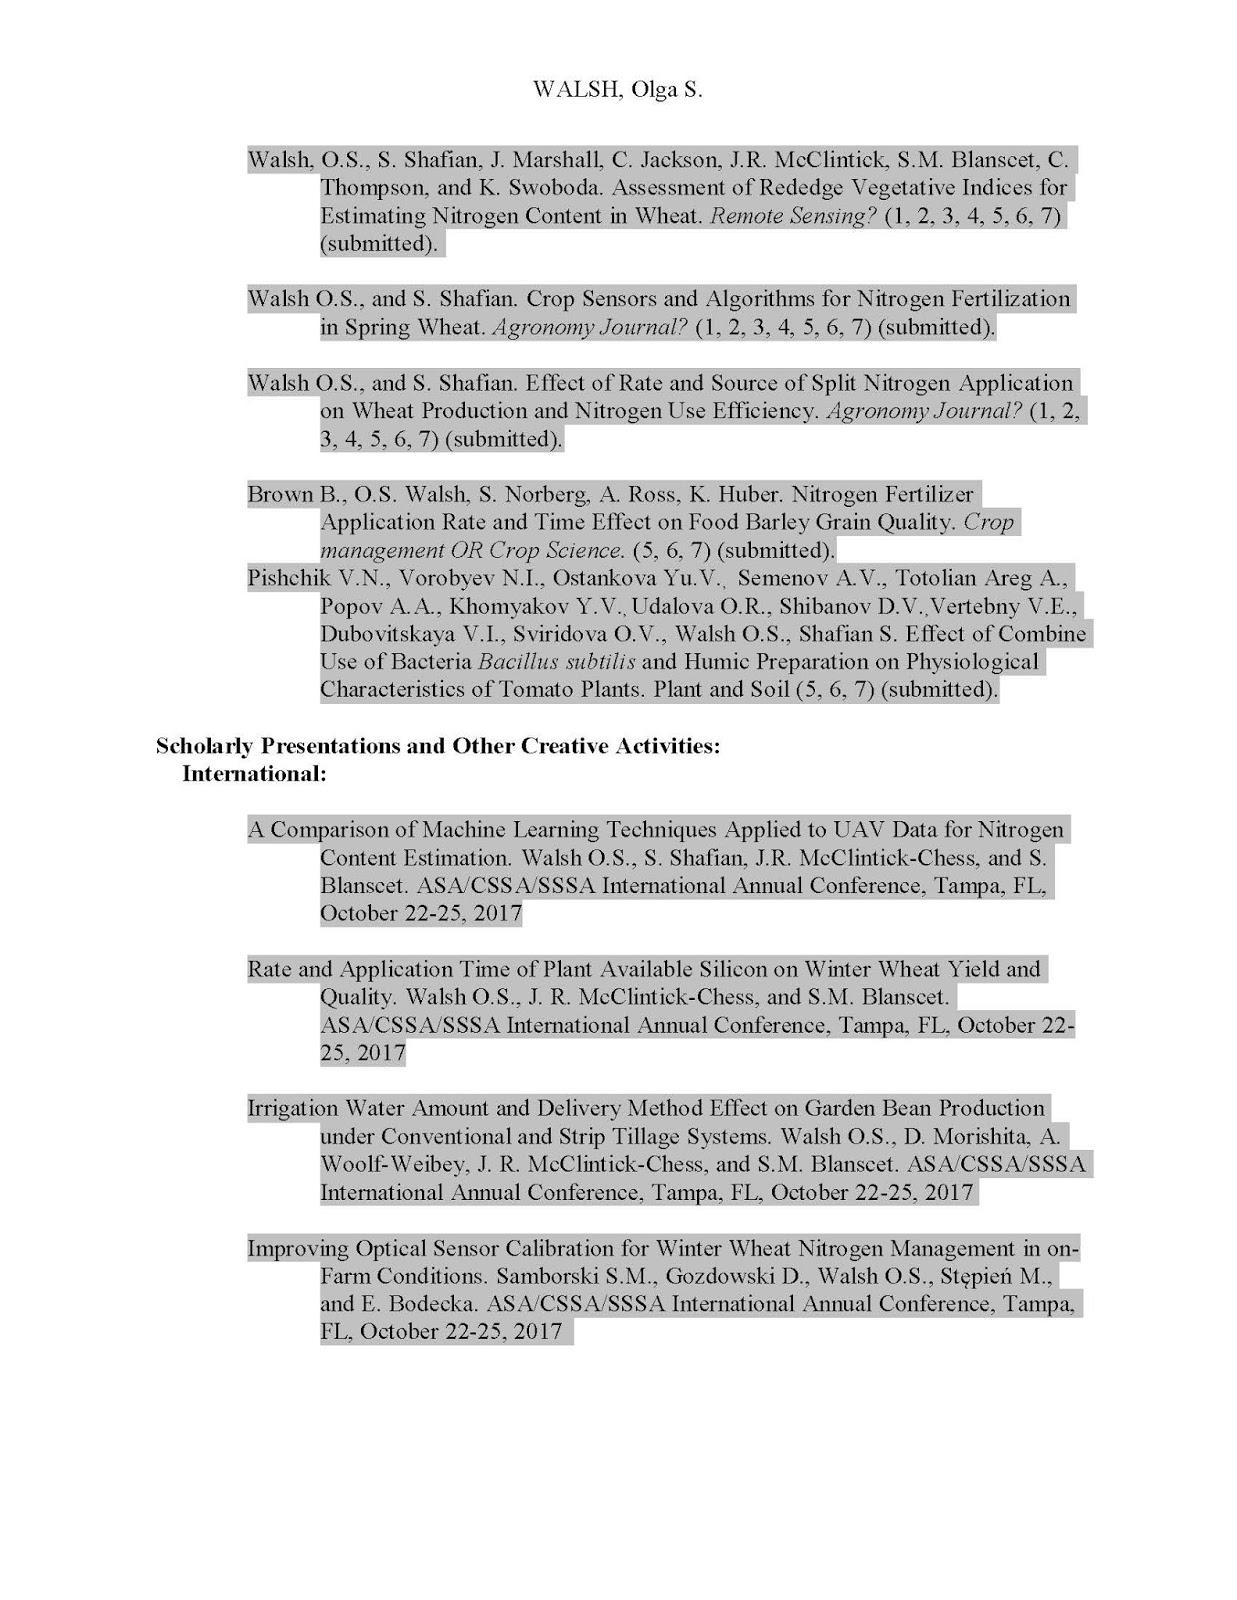 Großartig Assistentin Konditor Cv Probe Ideen - Entry Level Resume ...